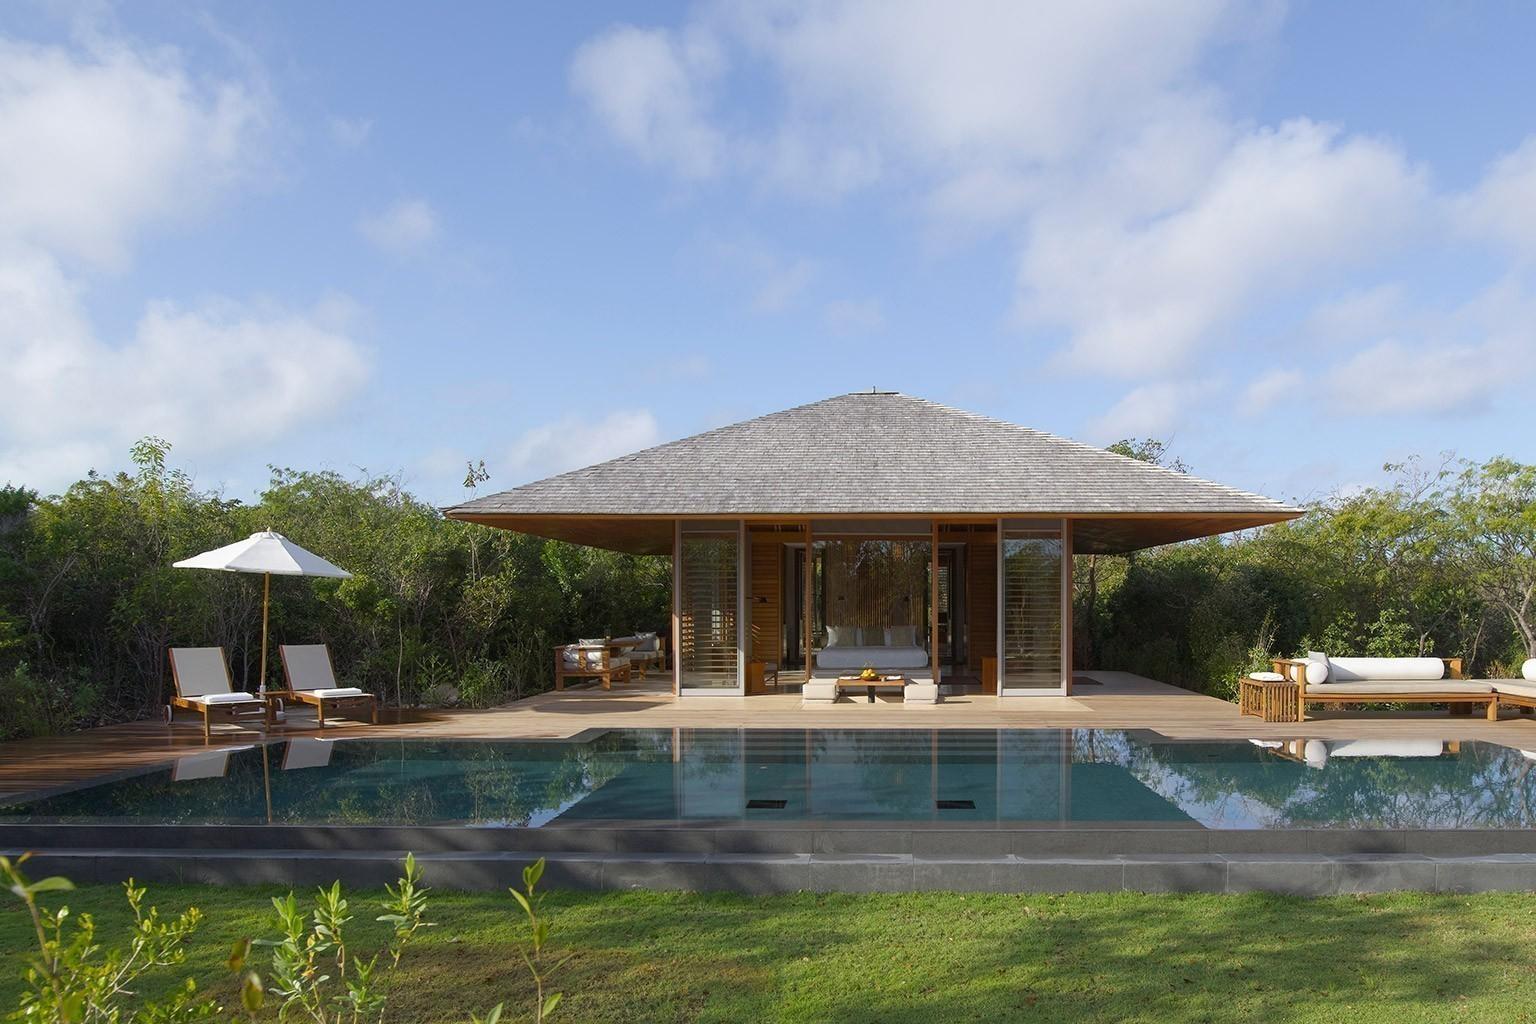 amanyara in der karibik luxushotels bei designreisen. Black Bedroom Furniture Sets. Home Design Ideas